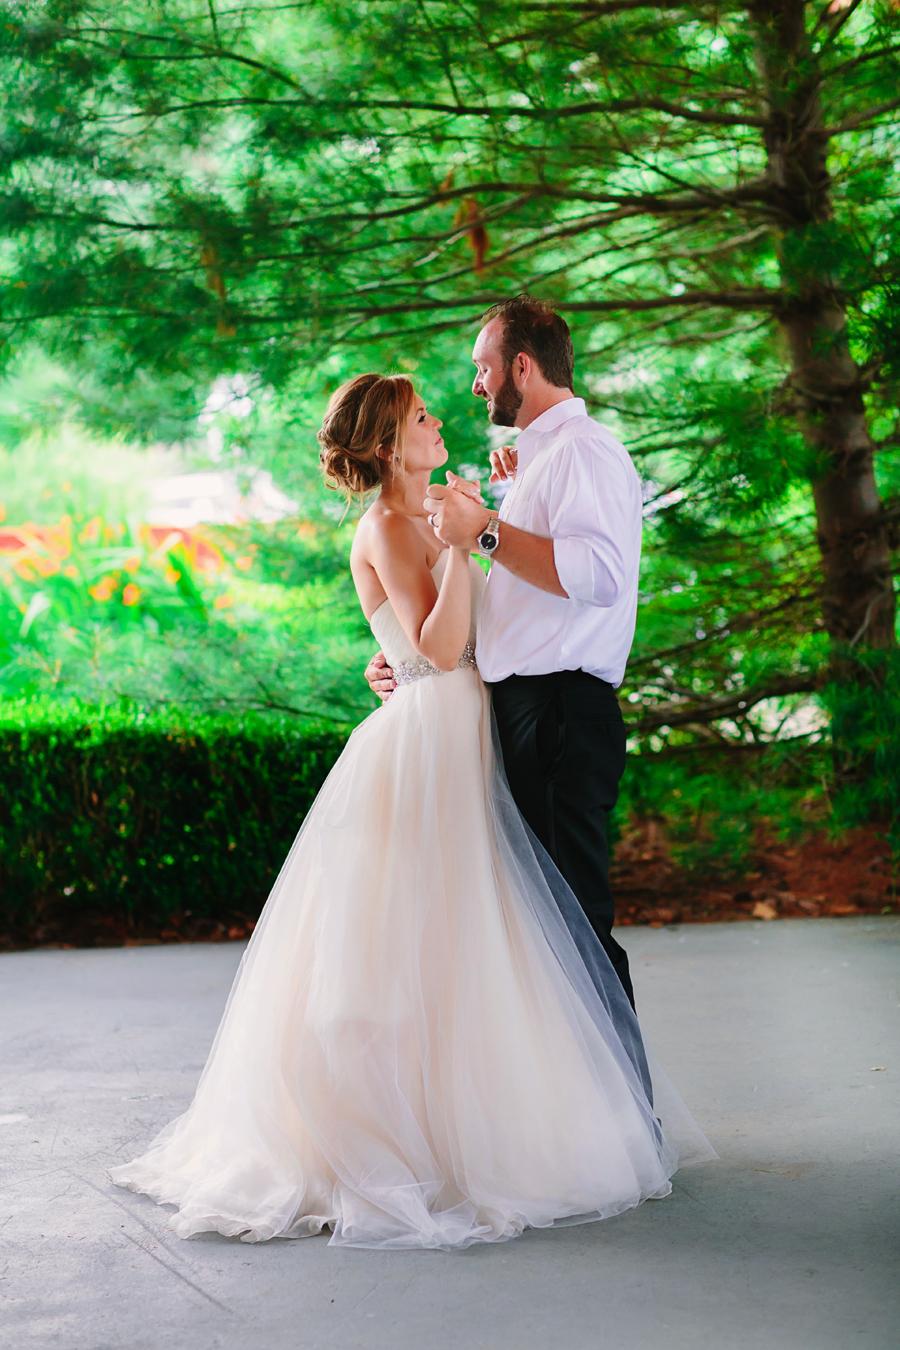 Saugatuck Arts Center Wedding175.jpg